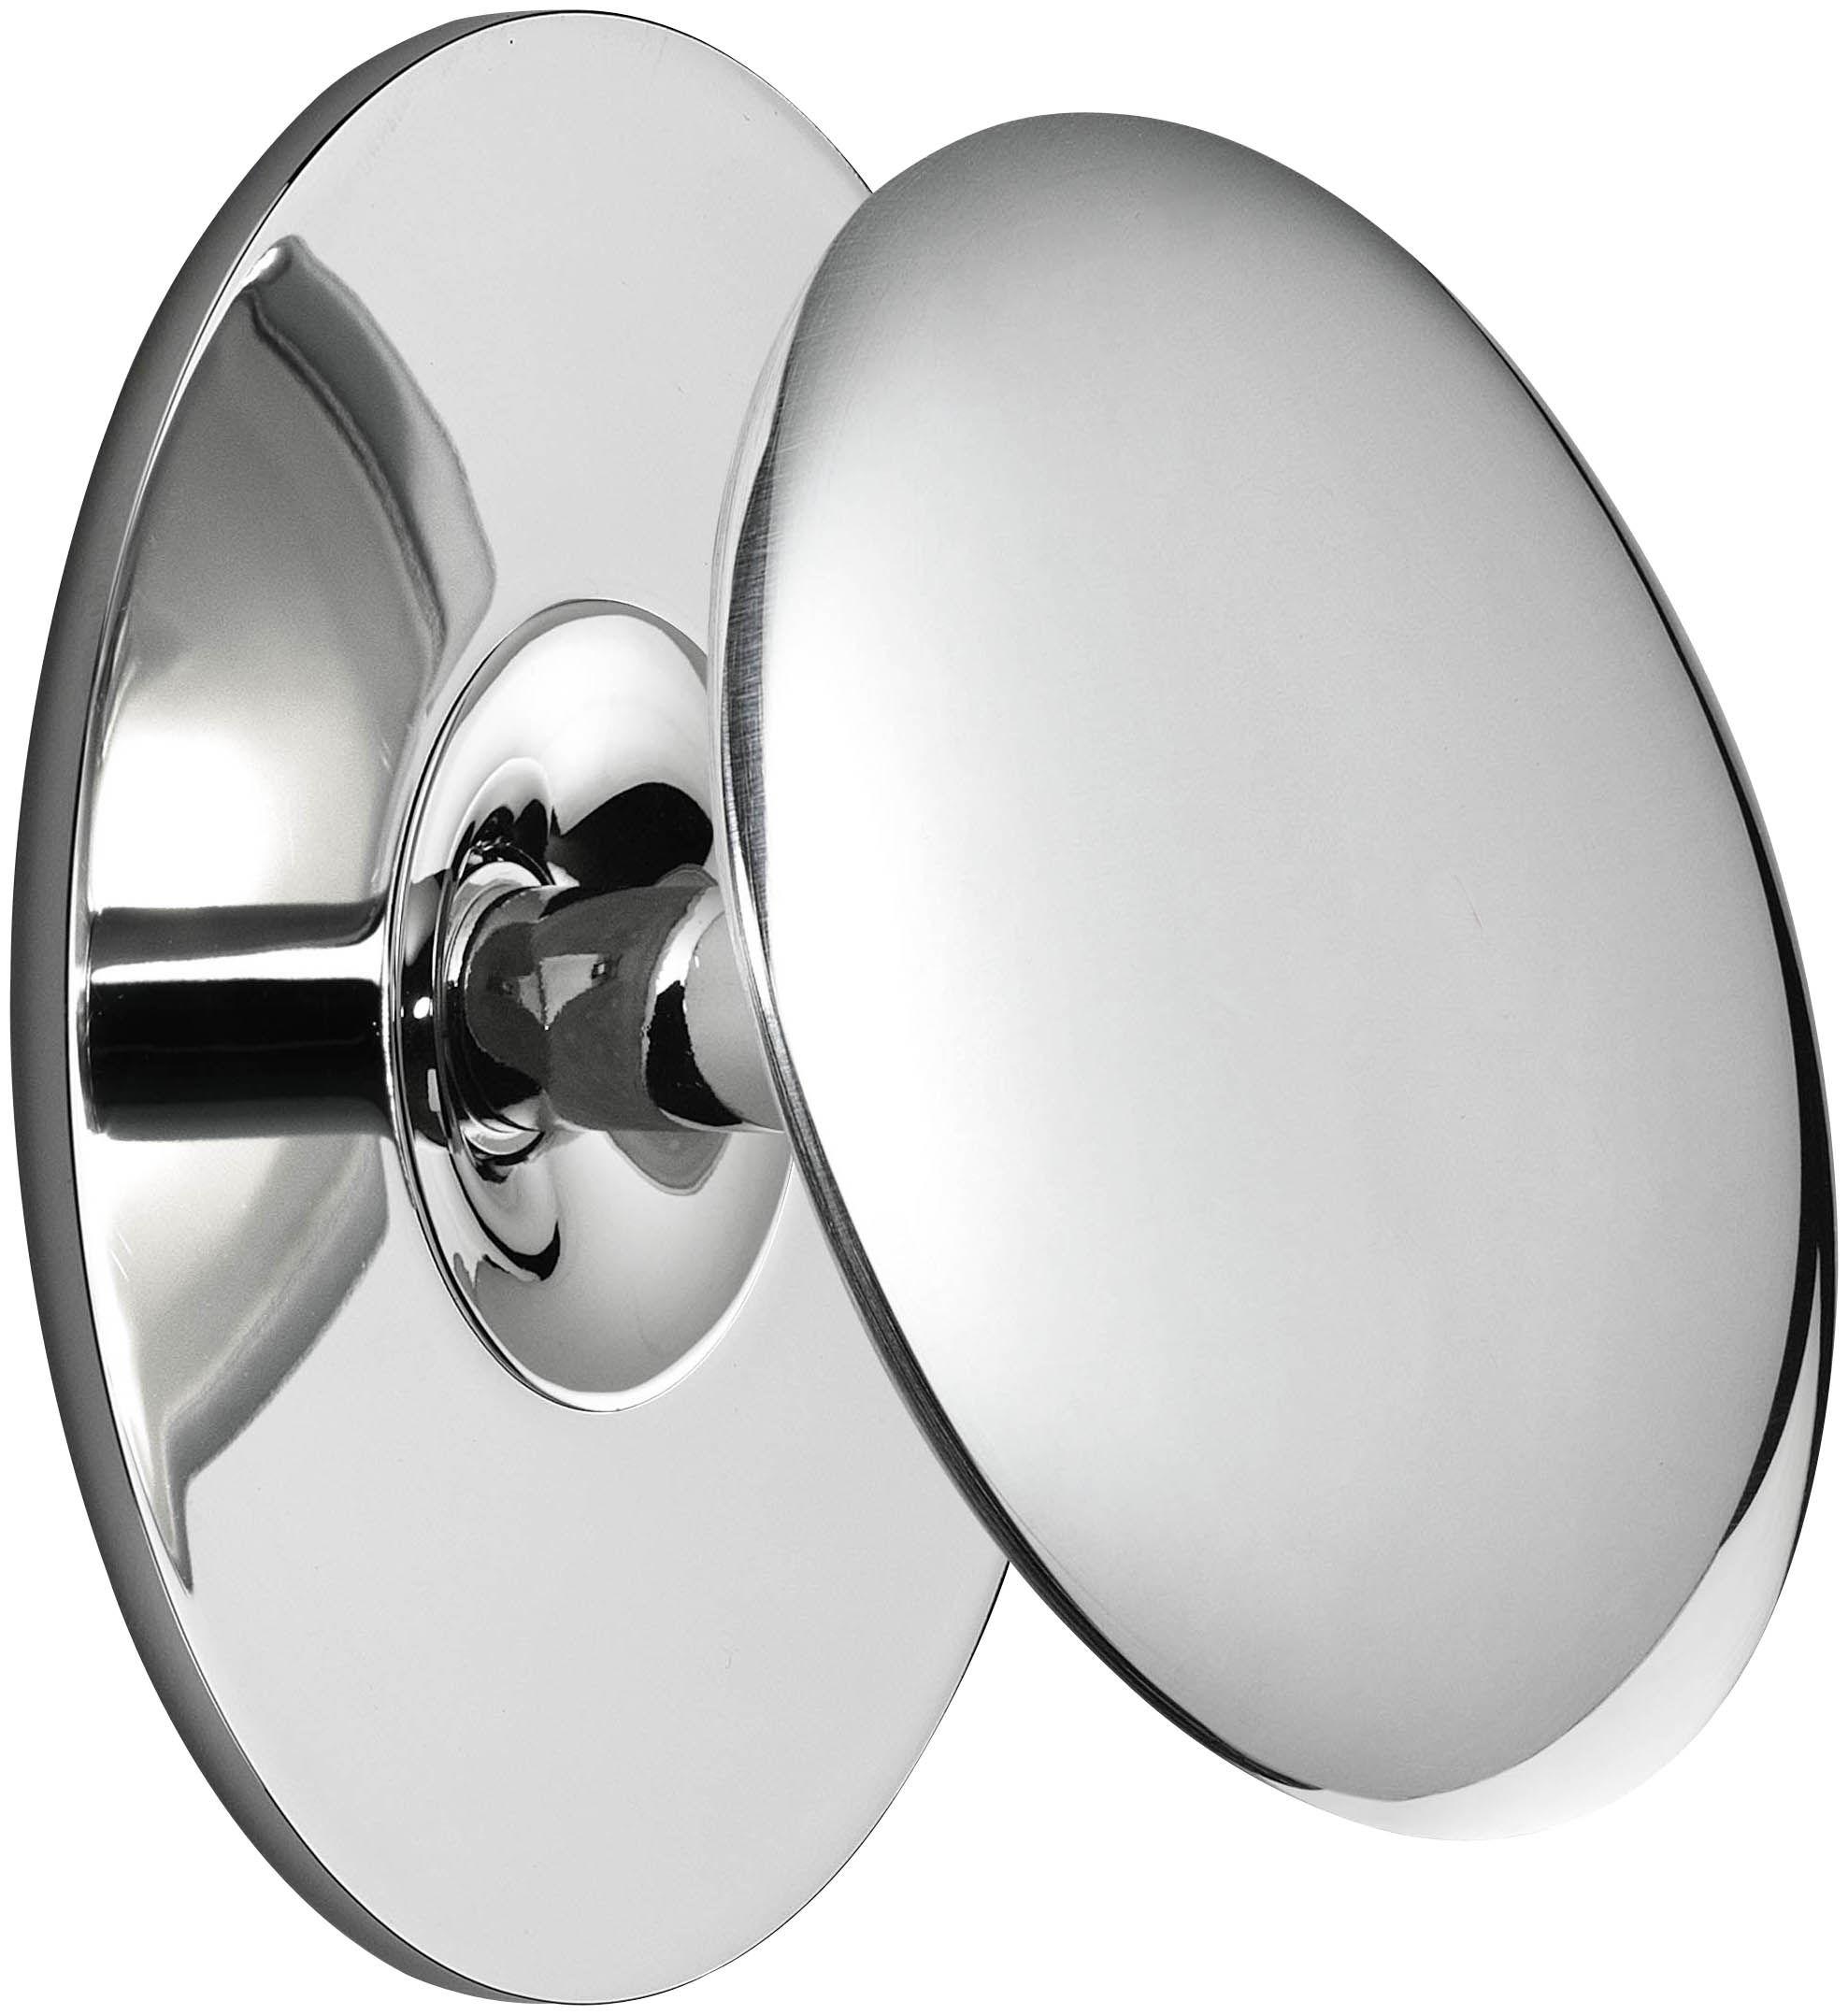 Leuchten - Wandleuchten - Back 2 LED Wandleuchte / Ø 13,1 cm - Flos - Chrom-glänzend - Aluminium moulé sous pression, Methacrylate